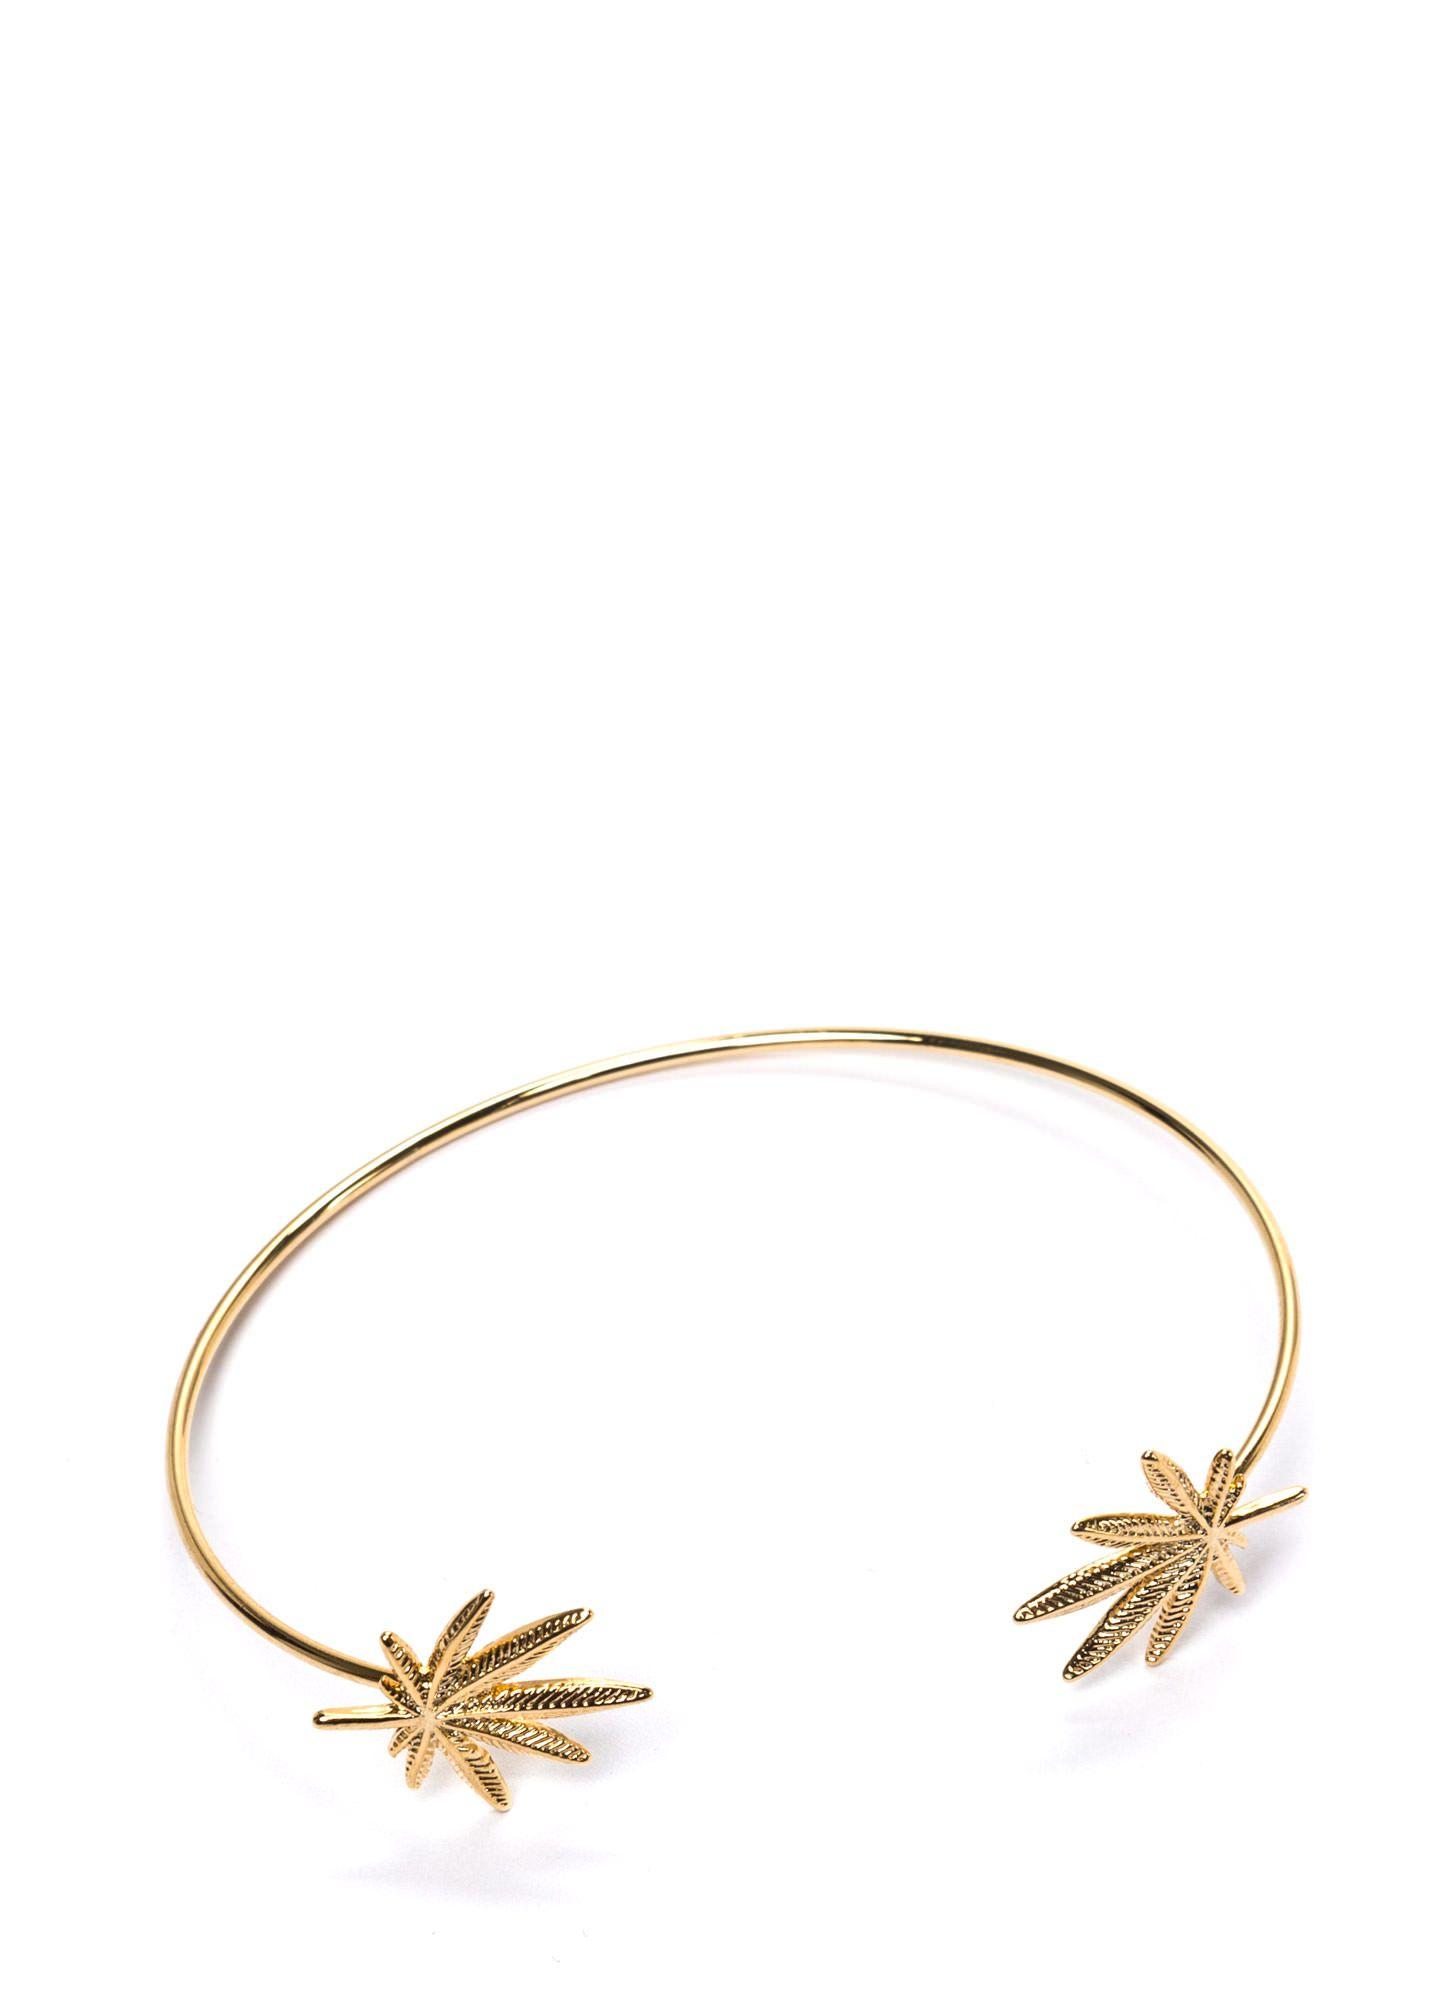 High Times Charm Bracelet GOLD SILVER - GoJane.com